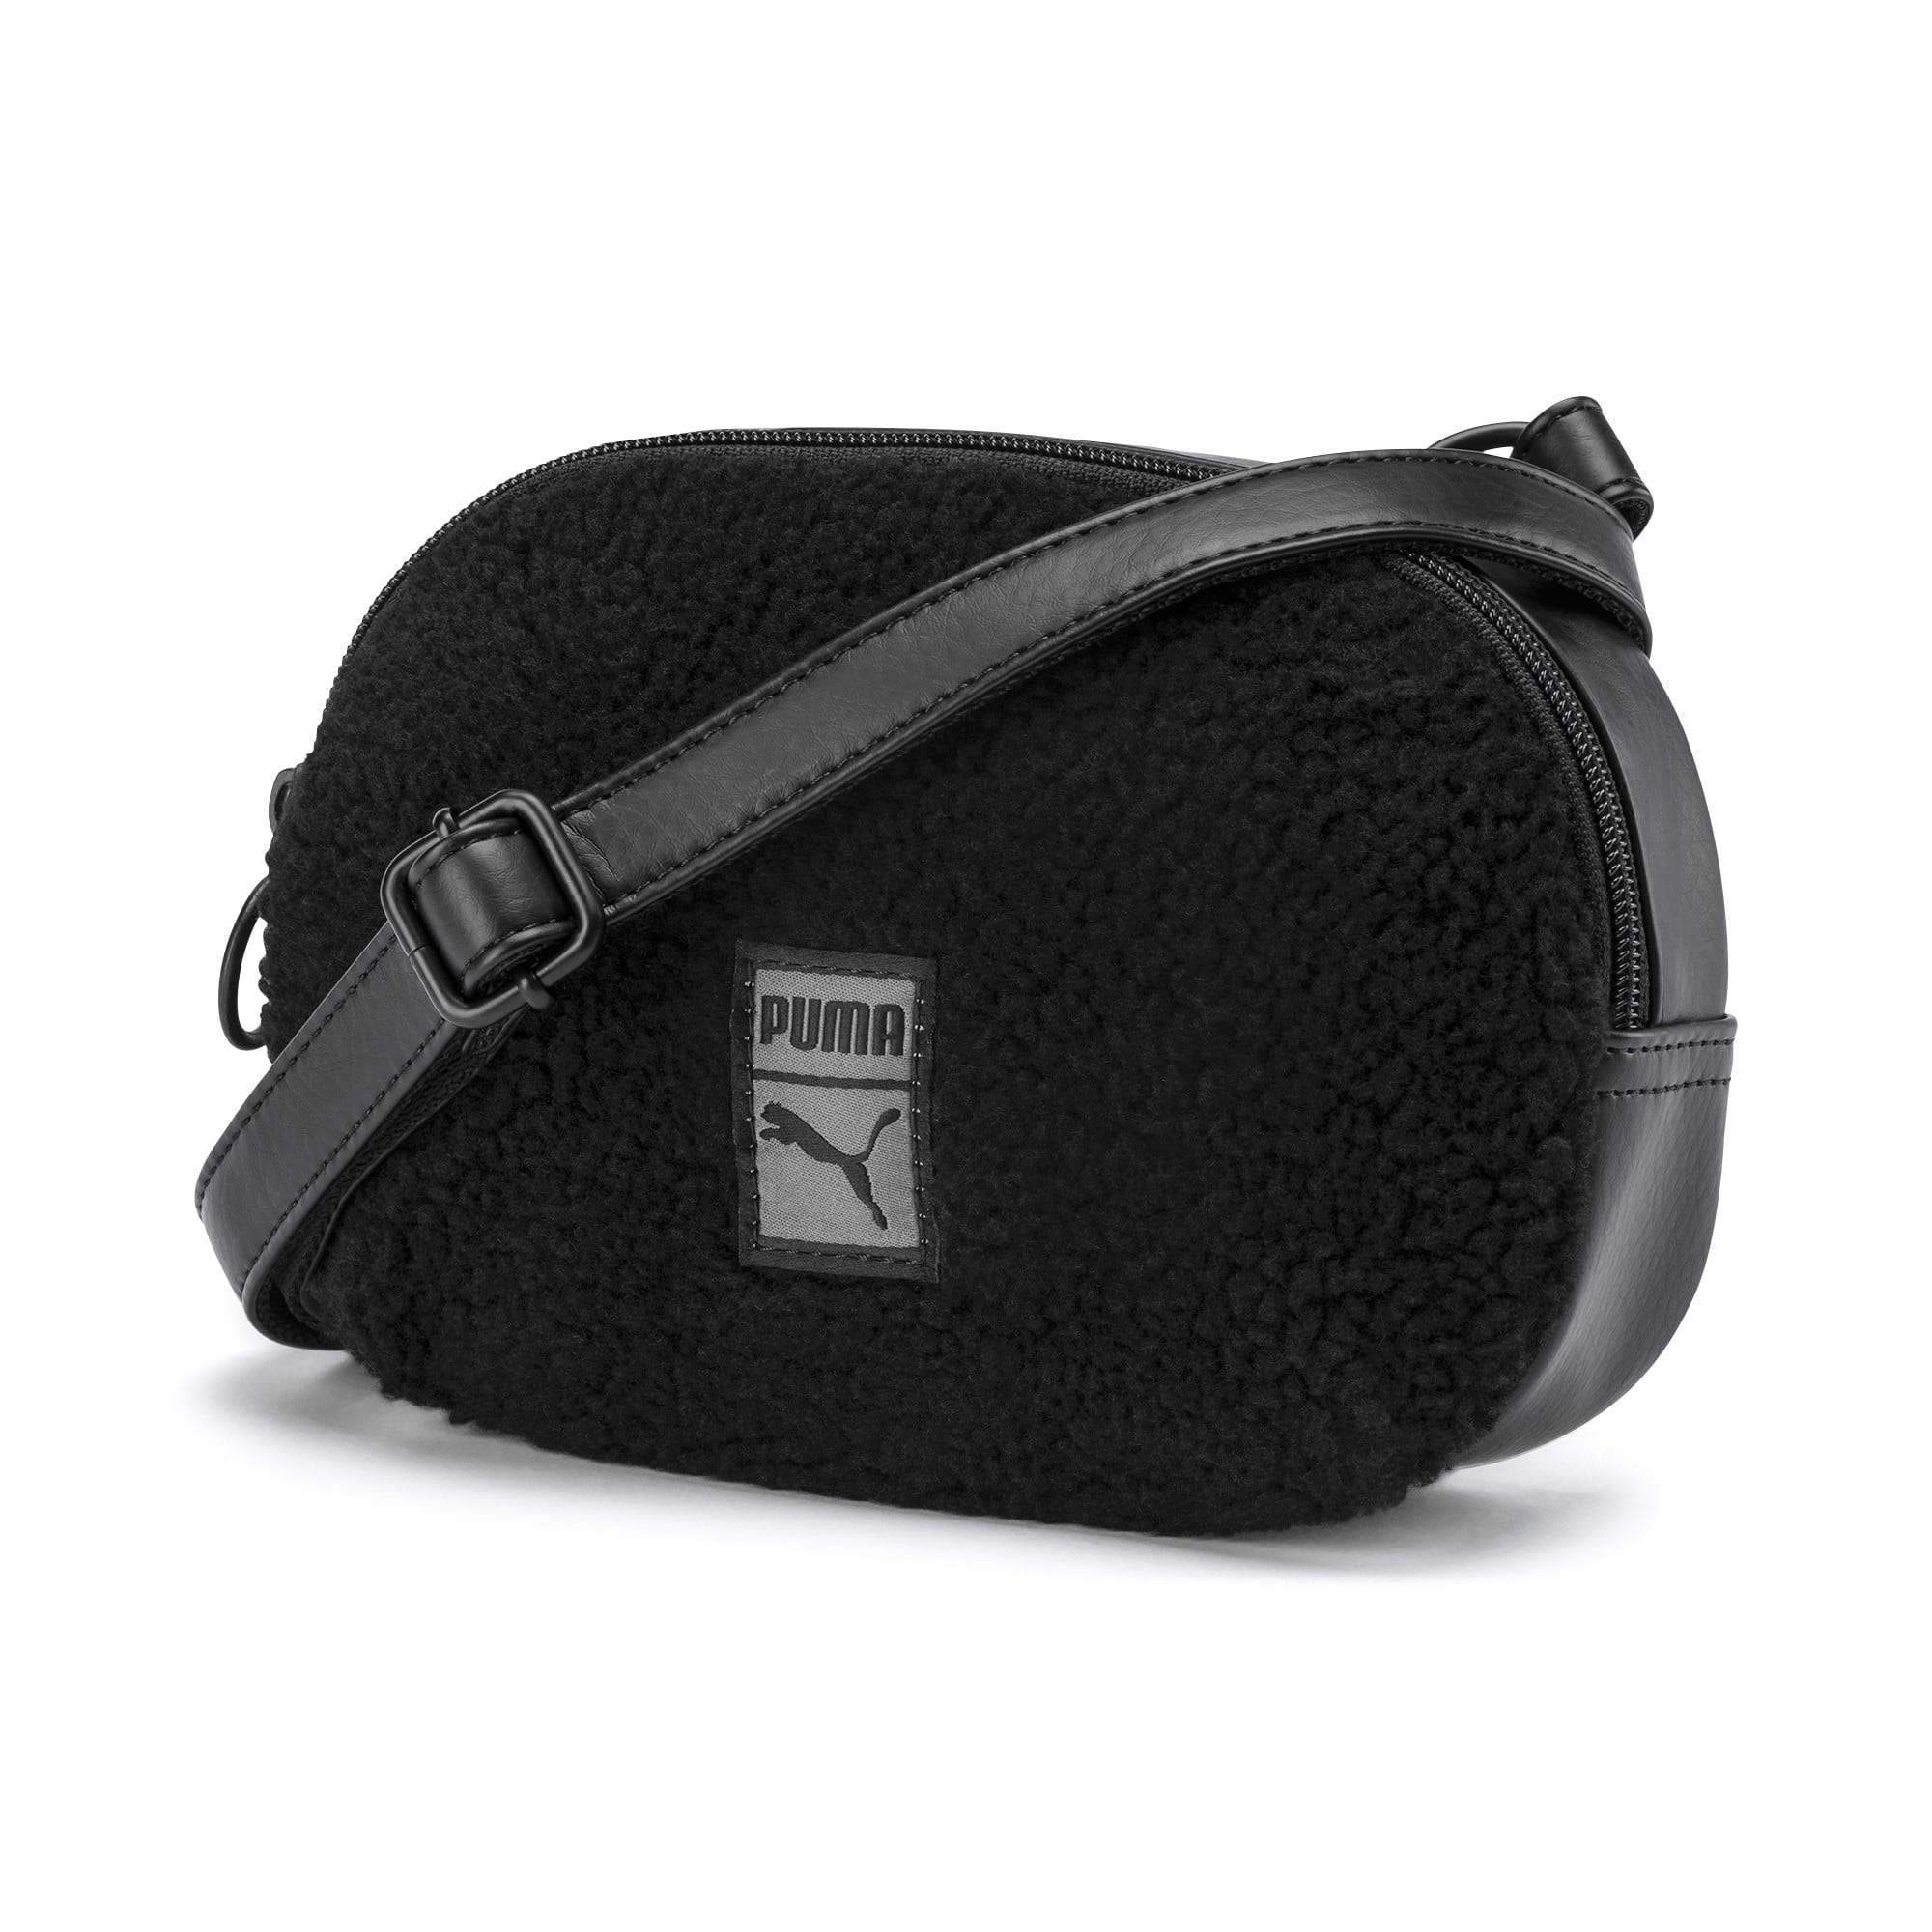 Thumbnail 1 of Prime Time Women's X-Body Bag, Puma Black-Puma Black, medium-IND